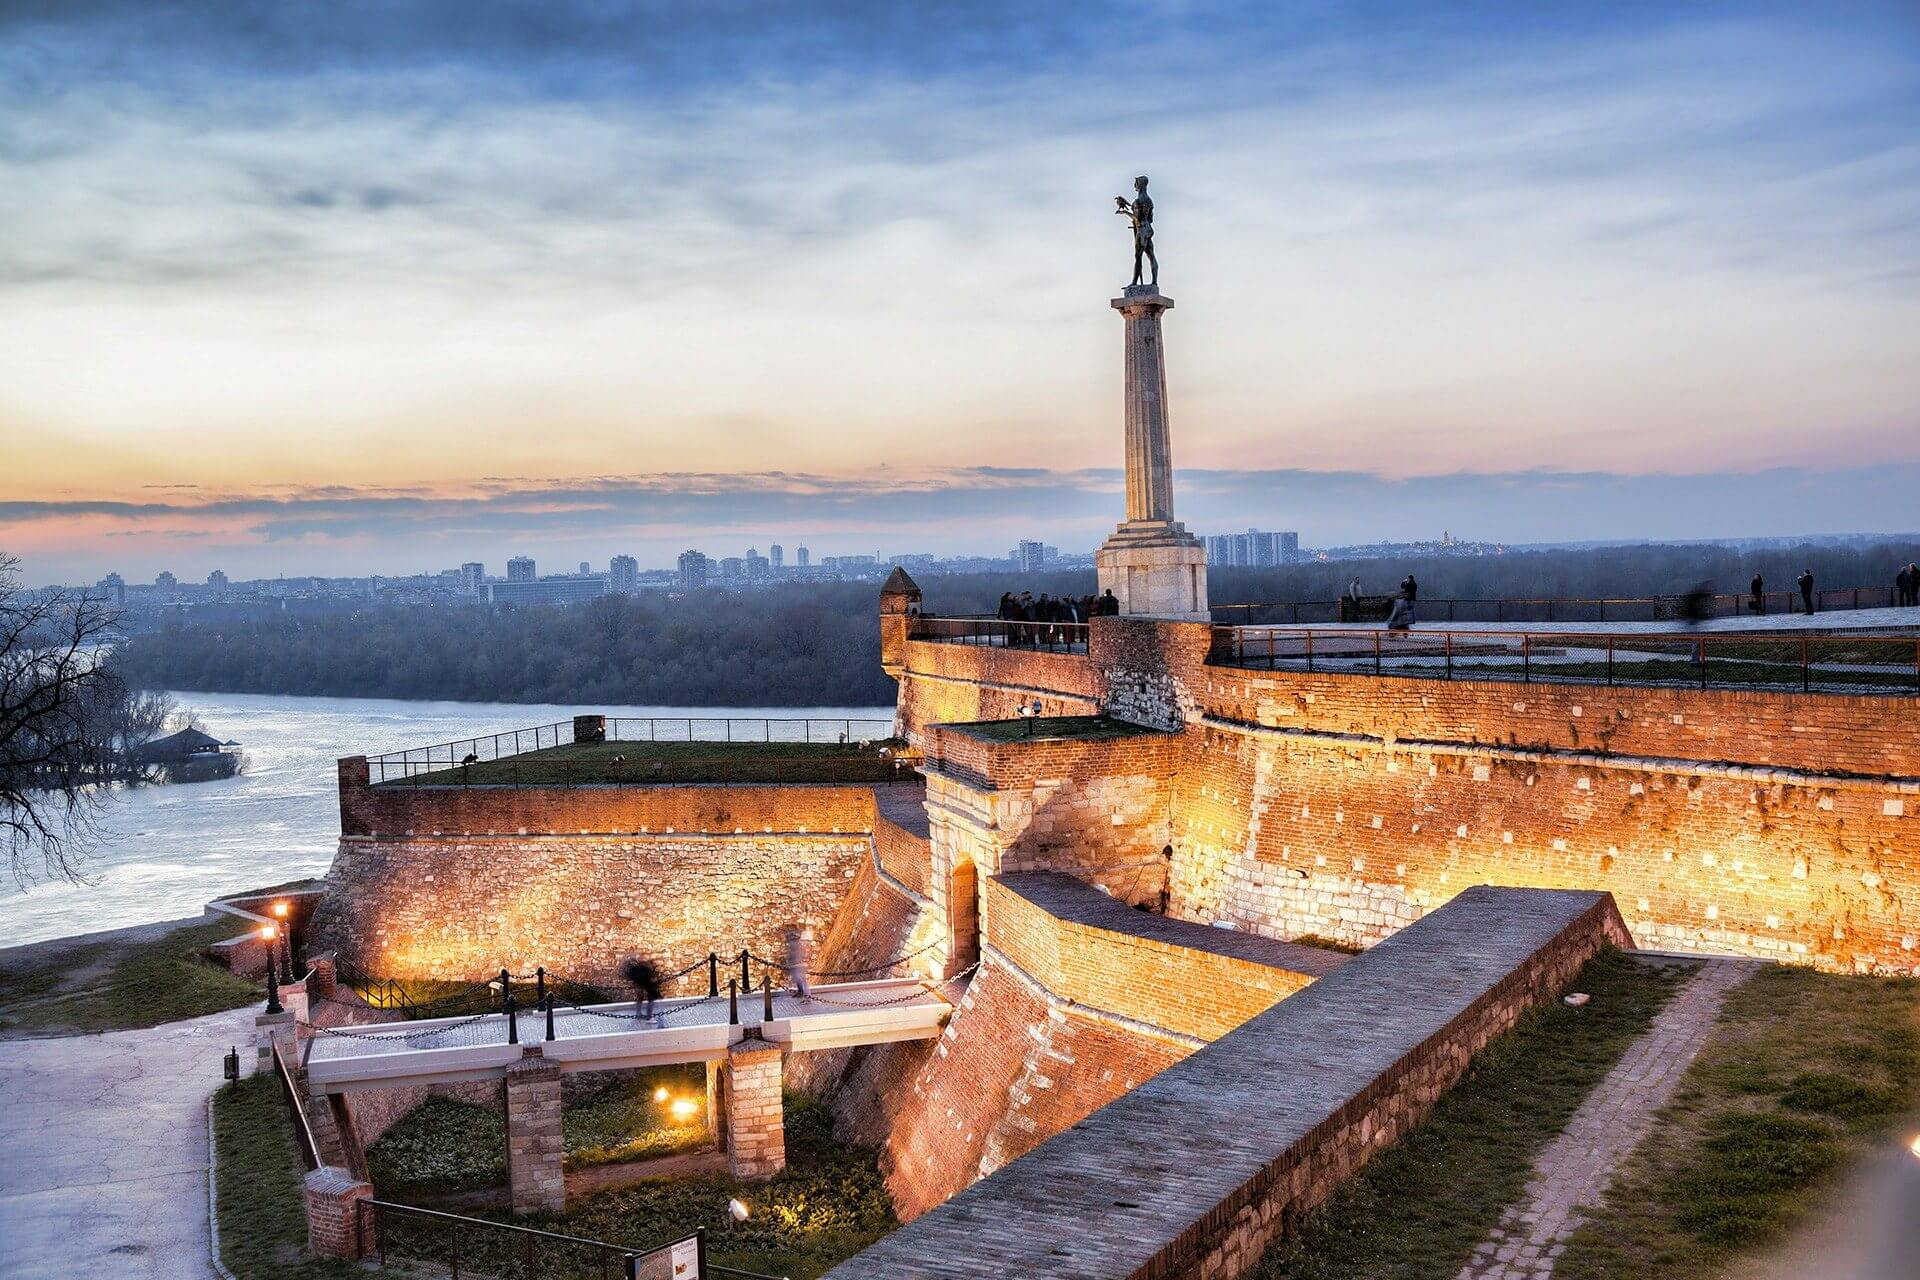 belgrad_fortress.jpg